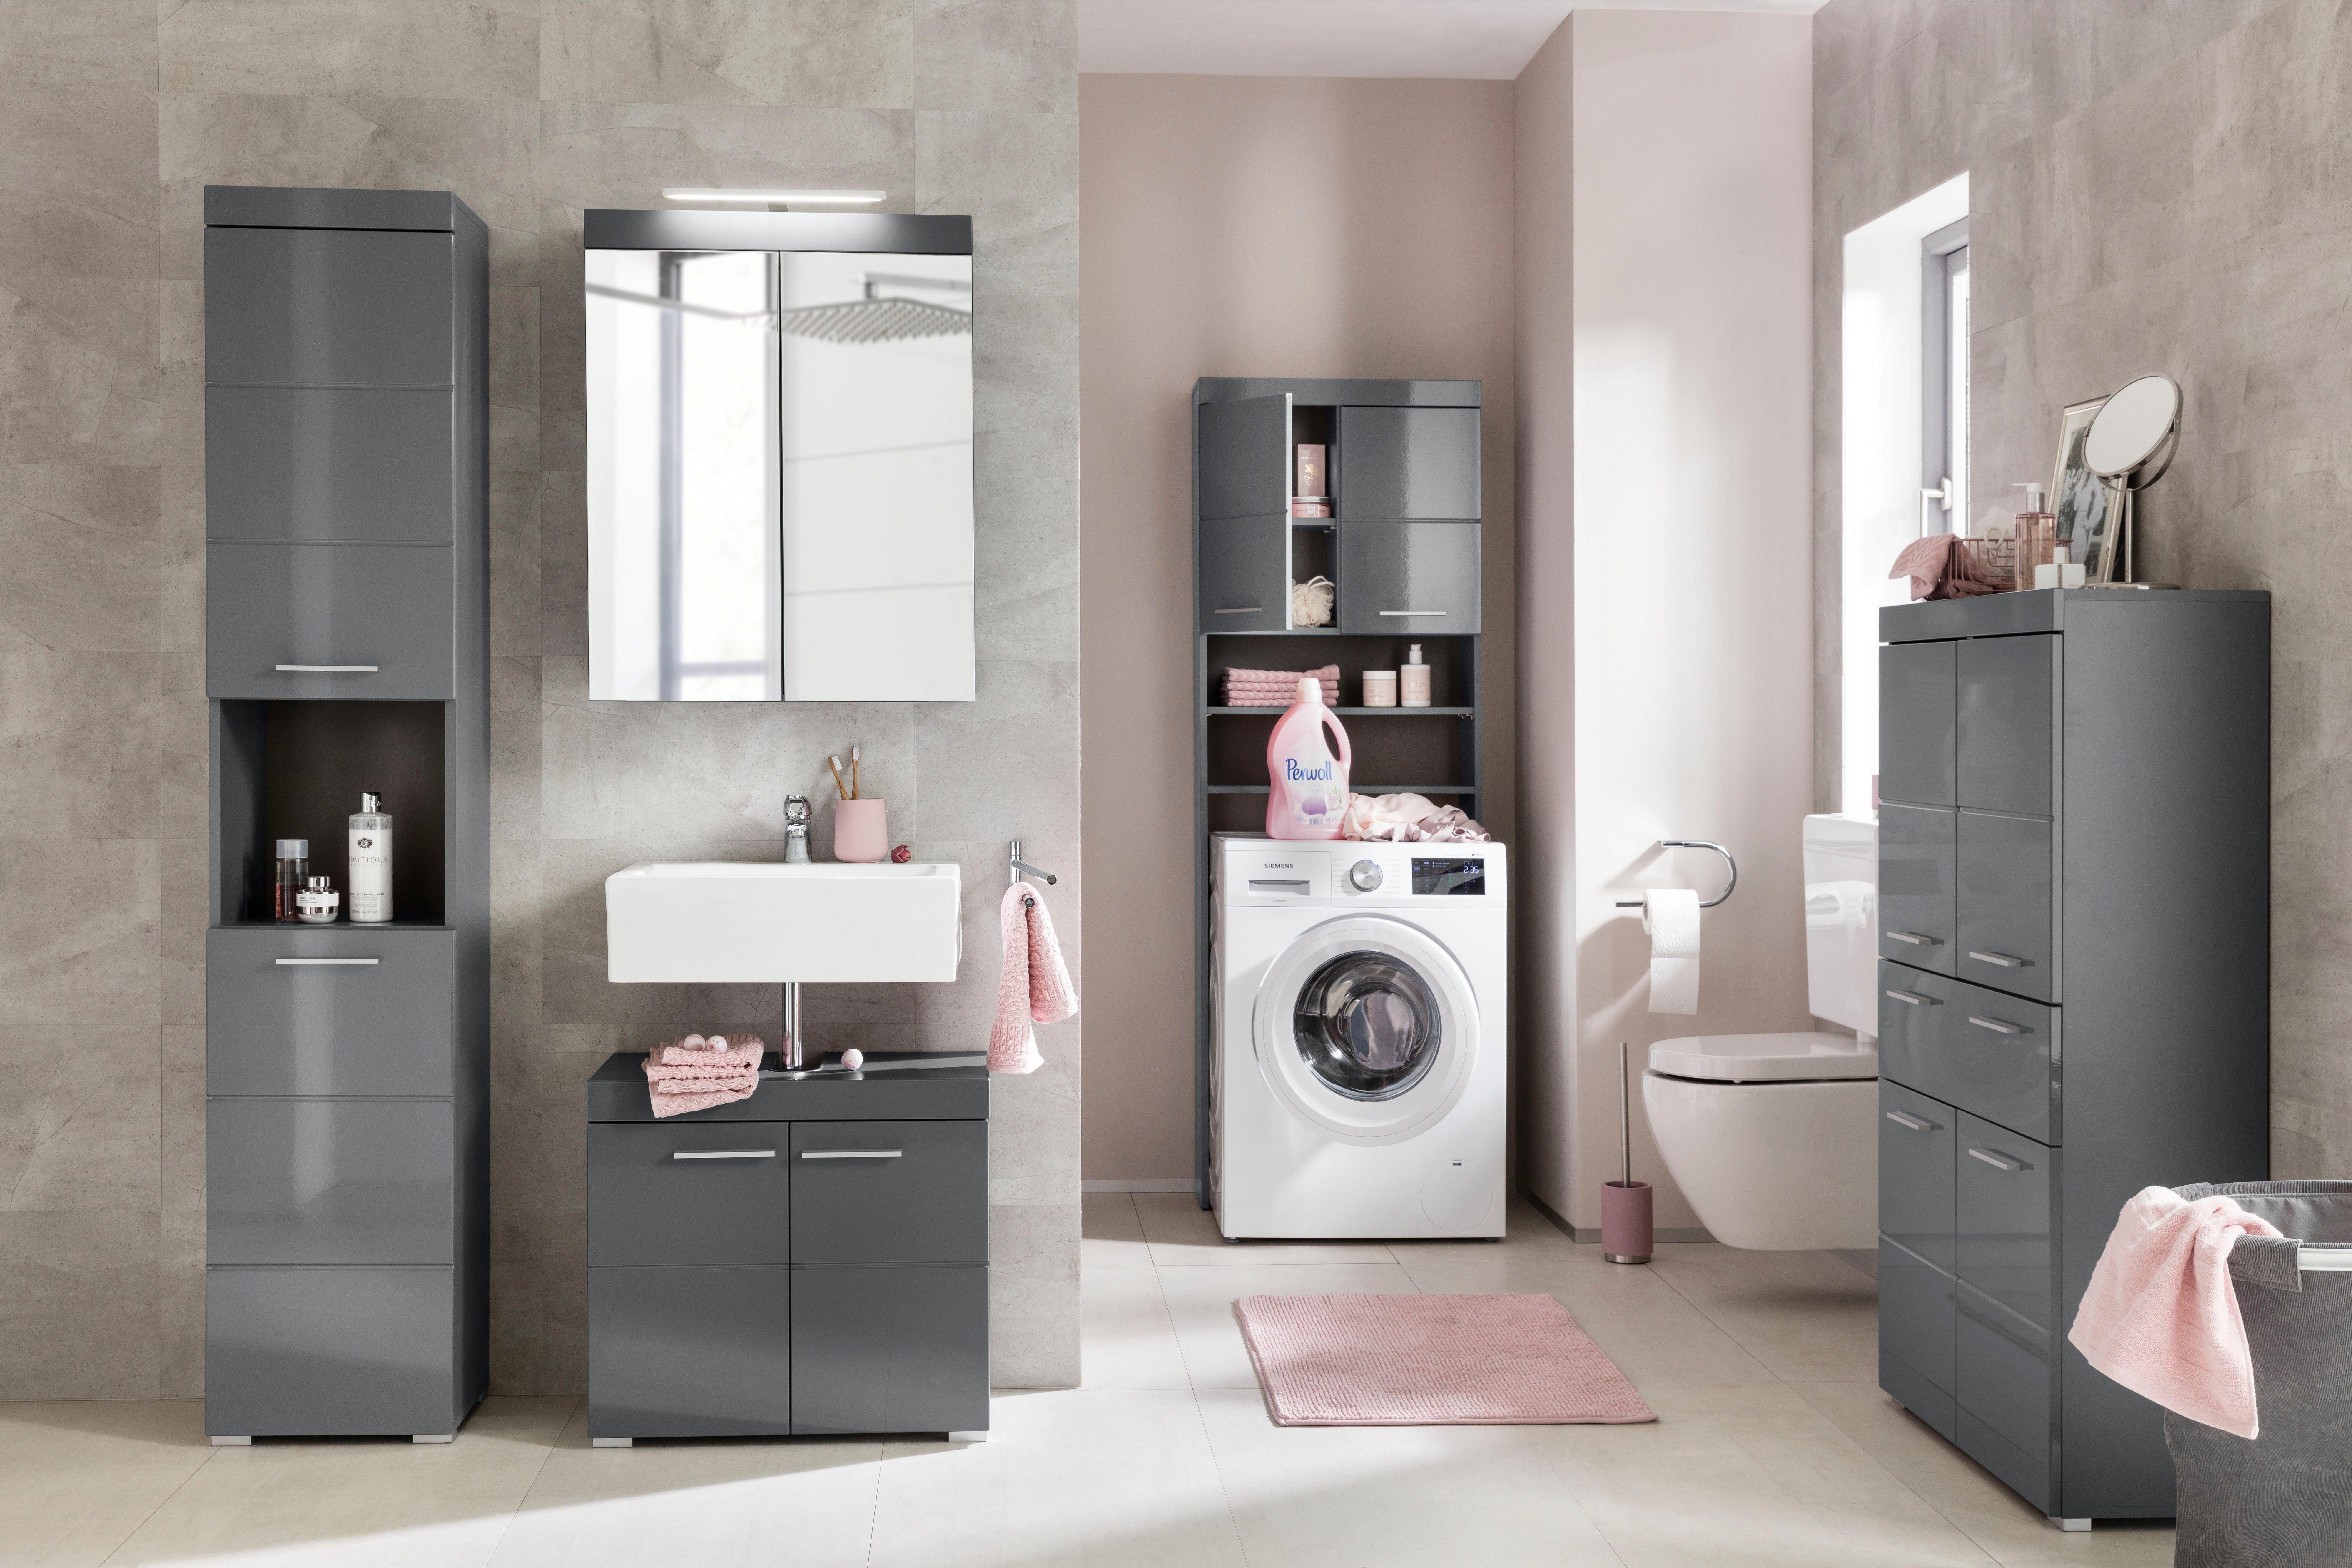 Kast Voor Wasmachine : Wasmachine droger kast ombouw maken werkspot